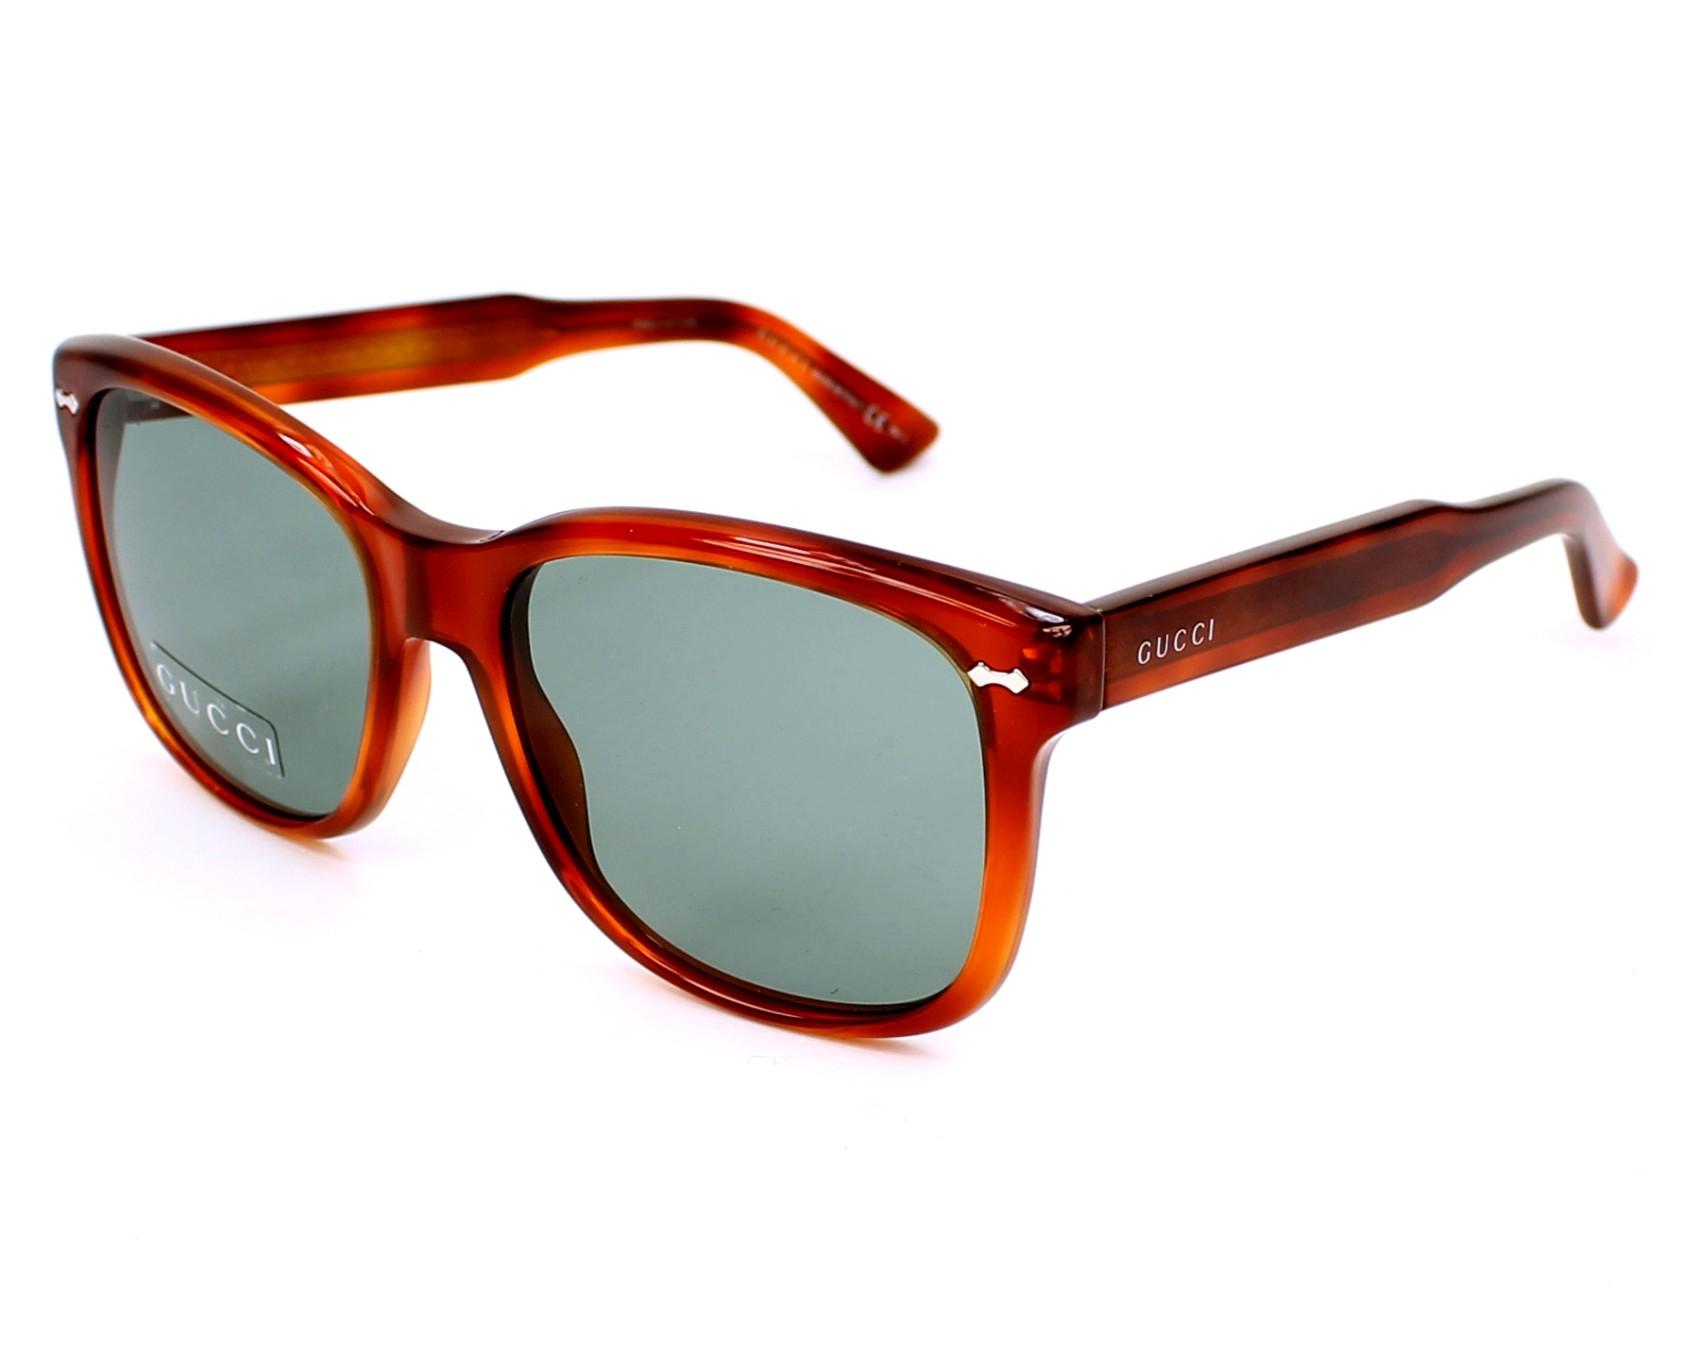 thumbnail Sunglasses Gucci GG-1134-S 056/5L - Brown profile view